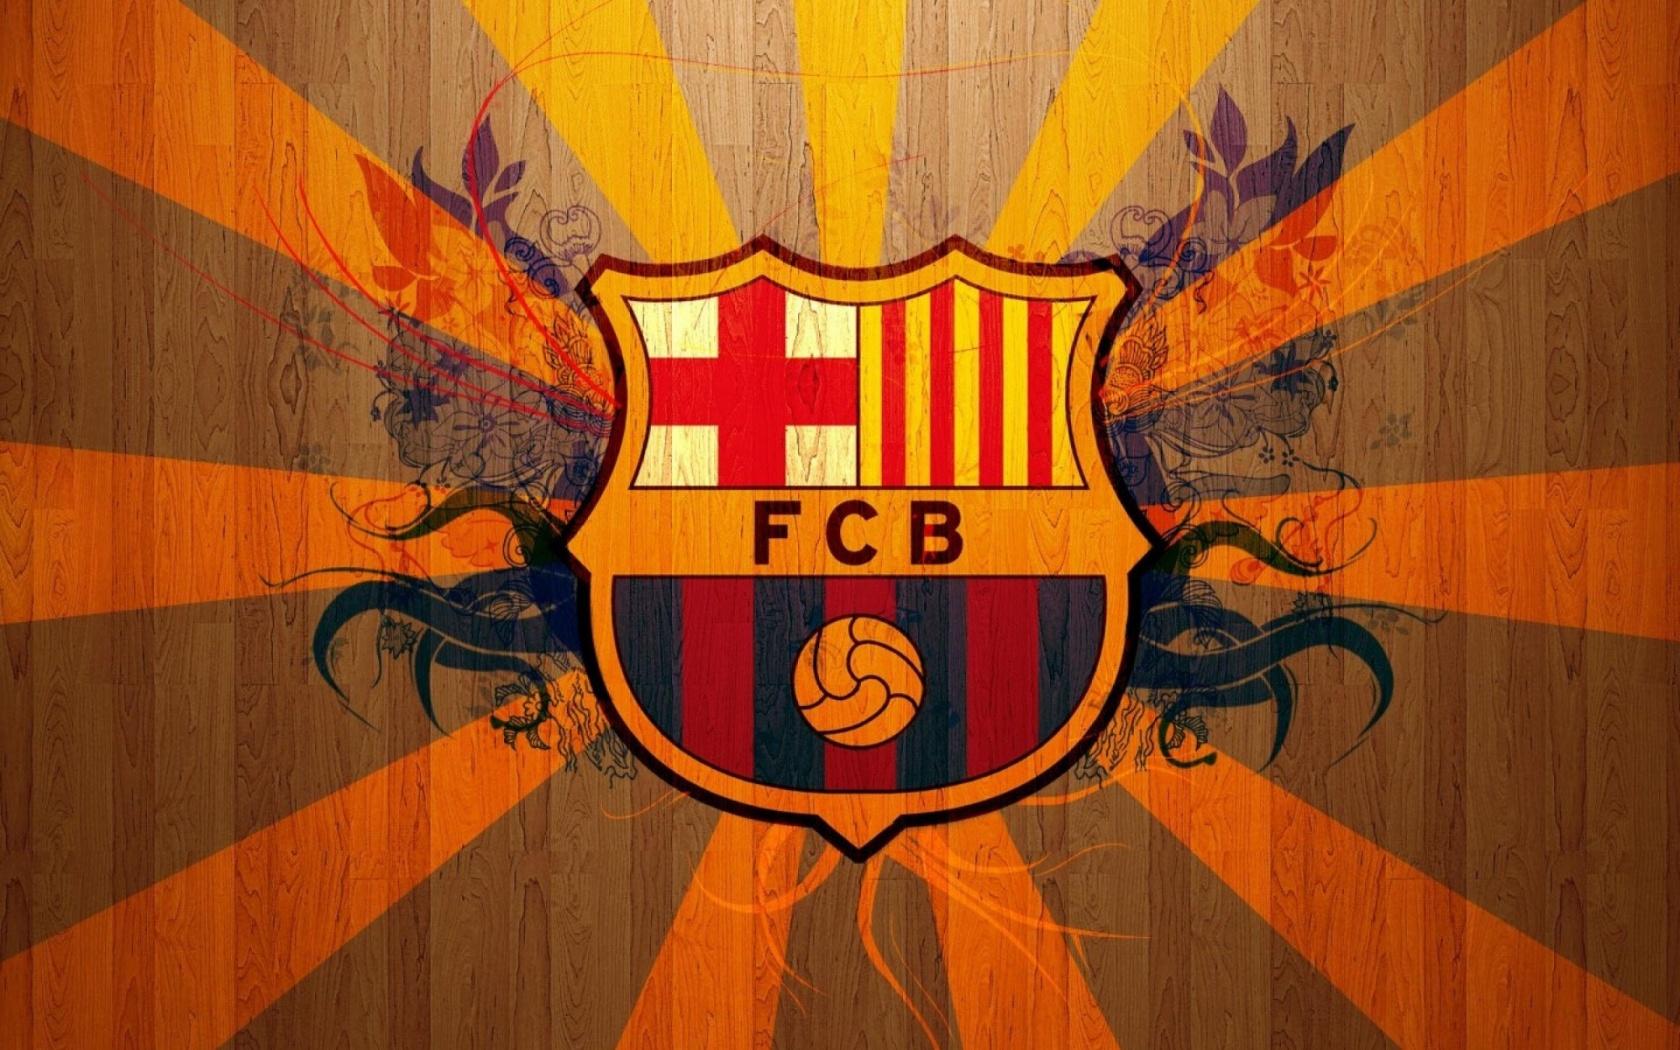 Barcelona Abstract Hd Wallpaper